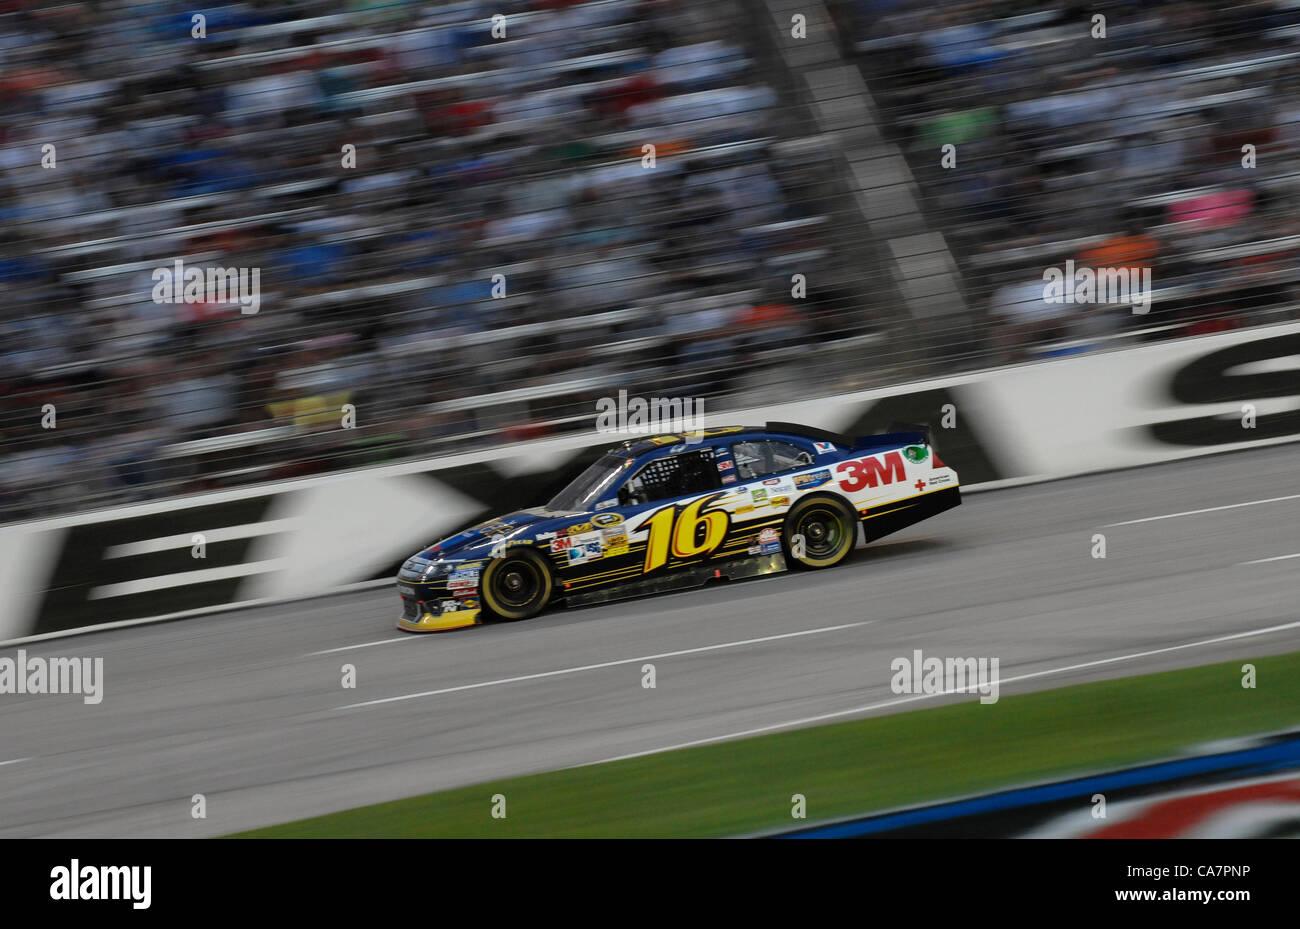 April 14, 2012 - Fort Worth, TX, USA - April 14, 2012 Ft. Worth, Tx. USA. Greg Biffle during the NASCAR Sprint Cup Stock Photo